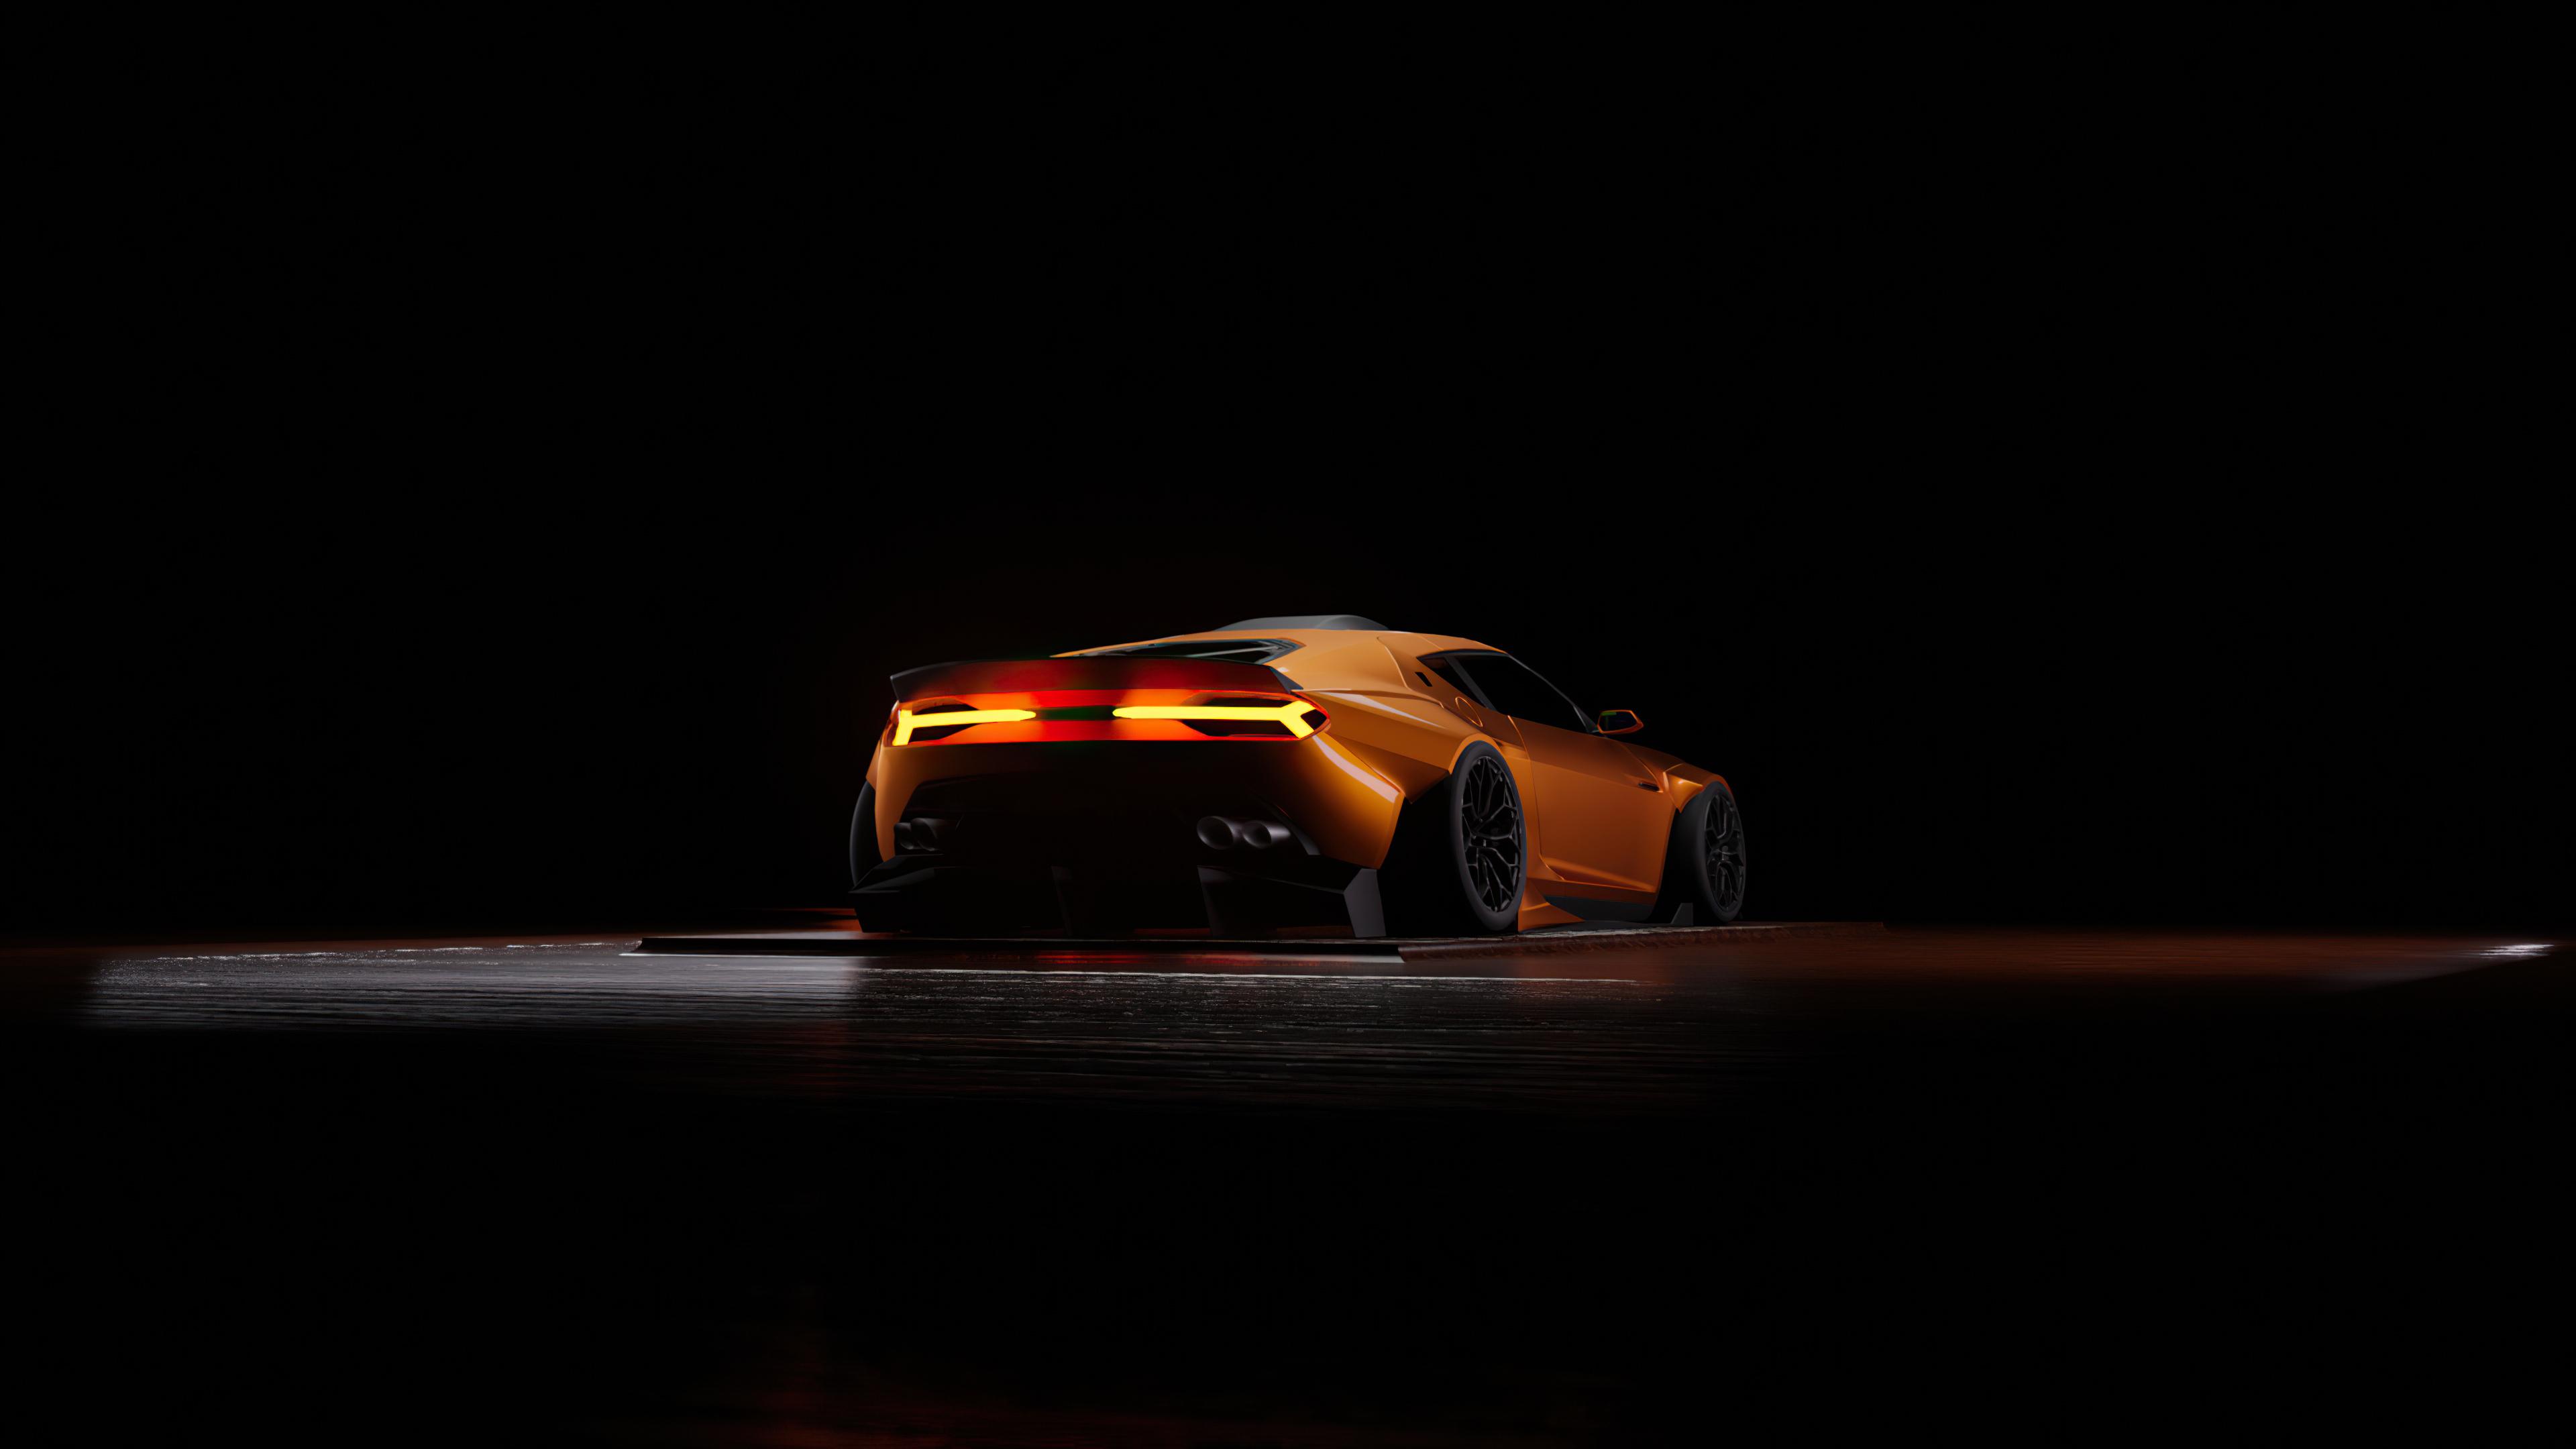 lamborghini asterion 4k 1620169518 - Lamborghini Asterion 4k - Lamborghini Asterion 4k wallpapers